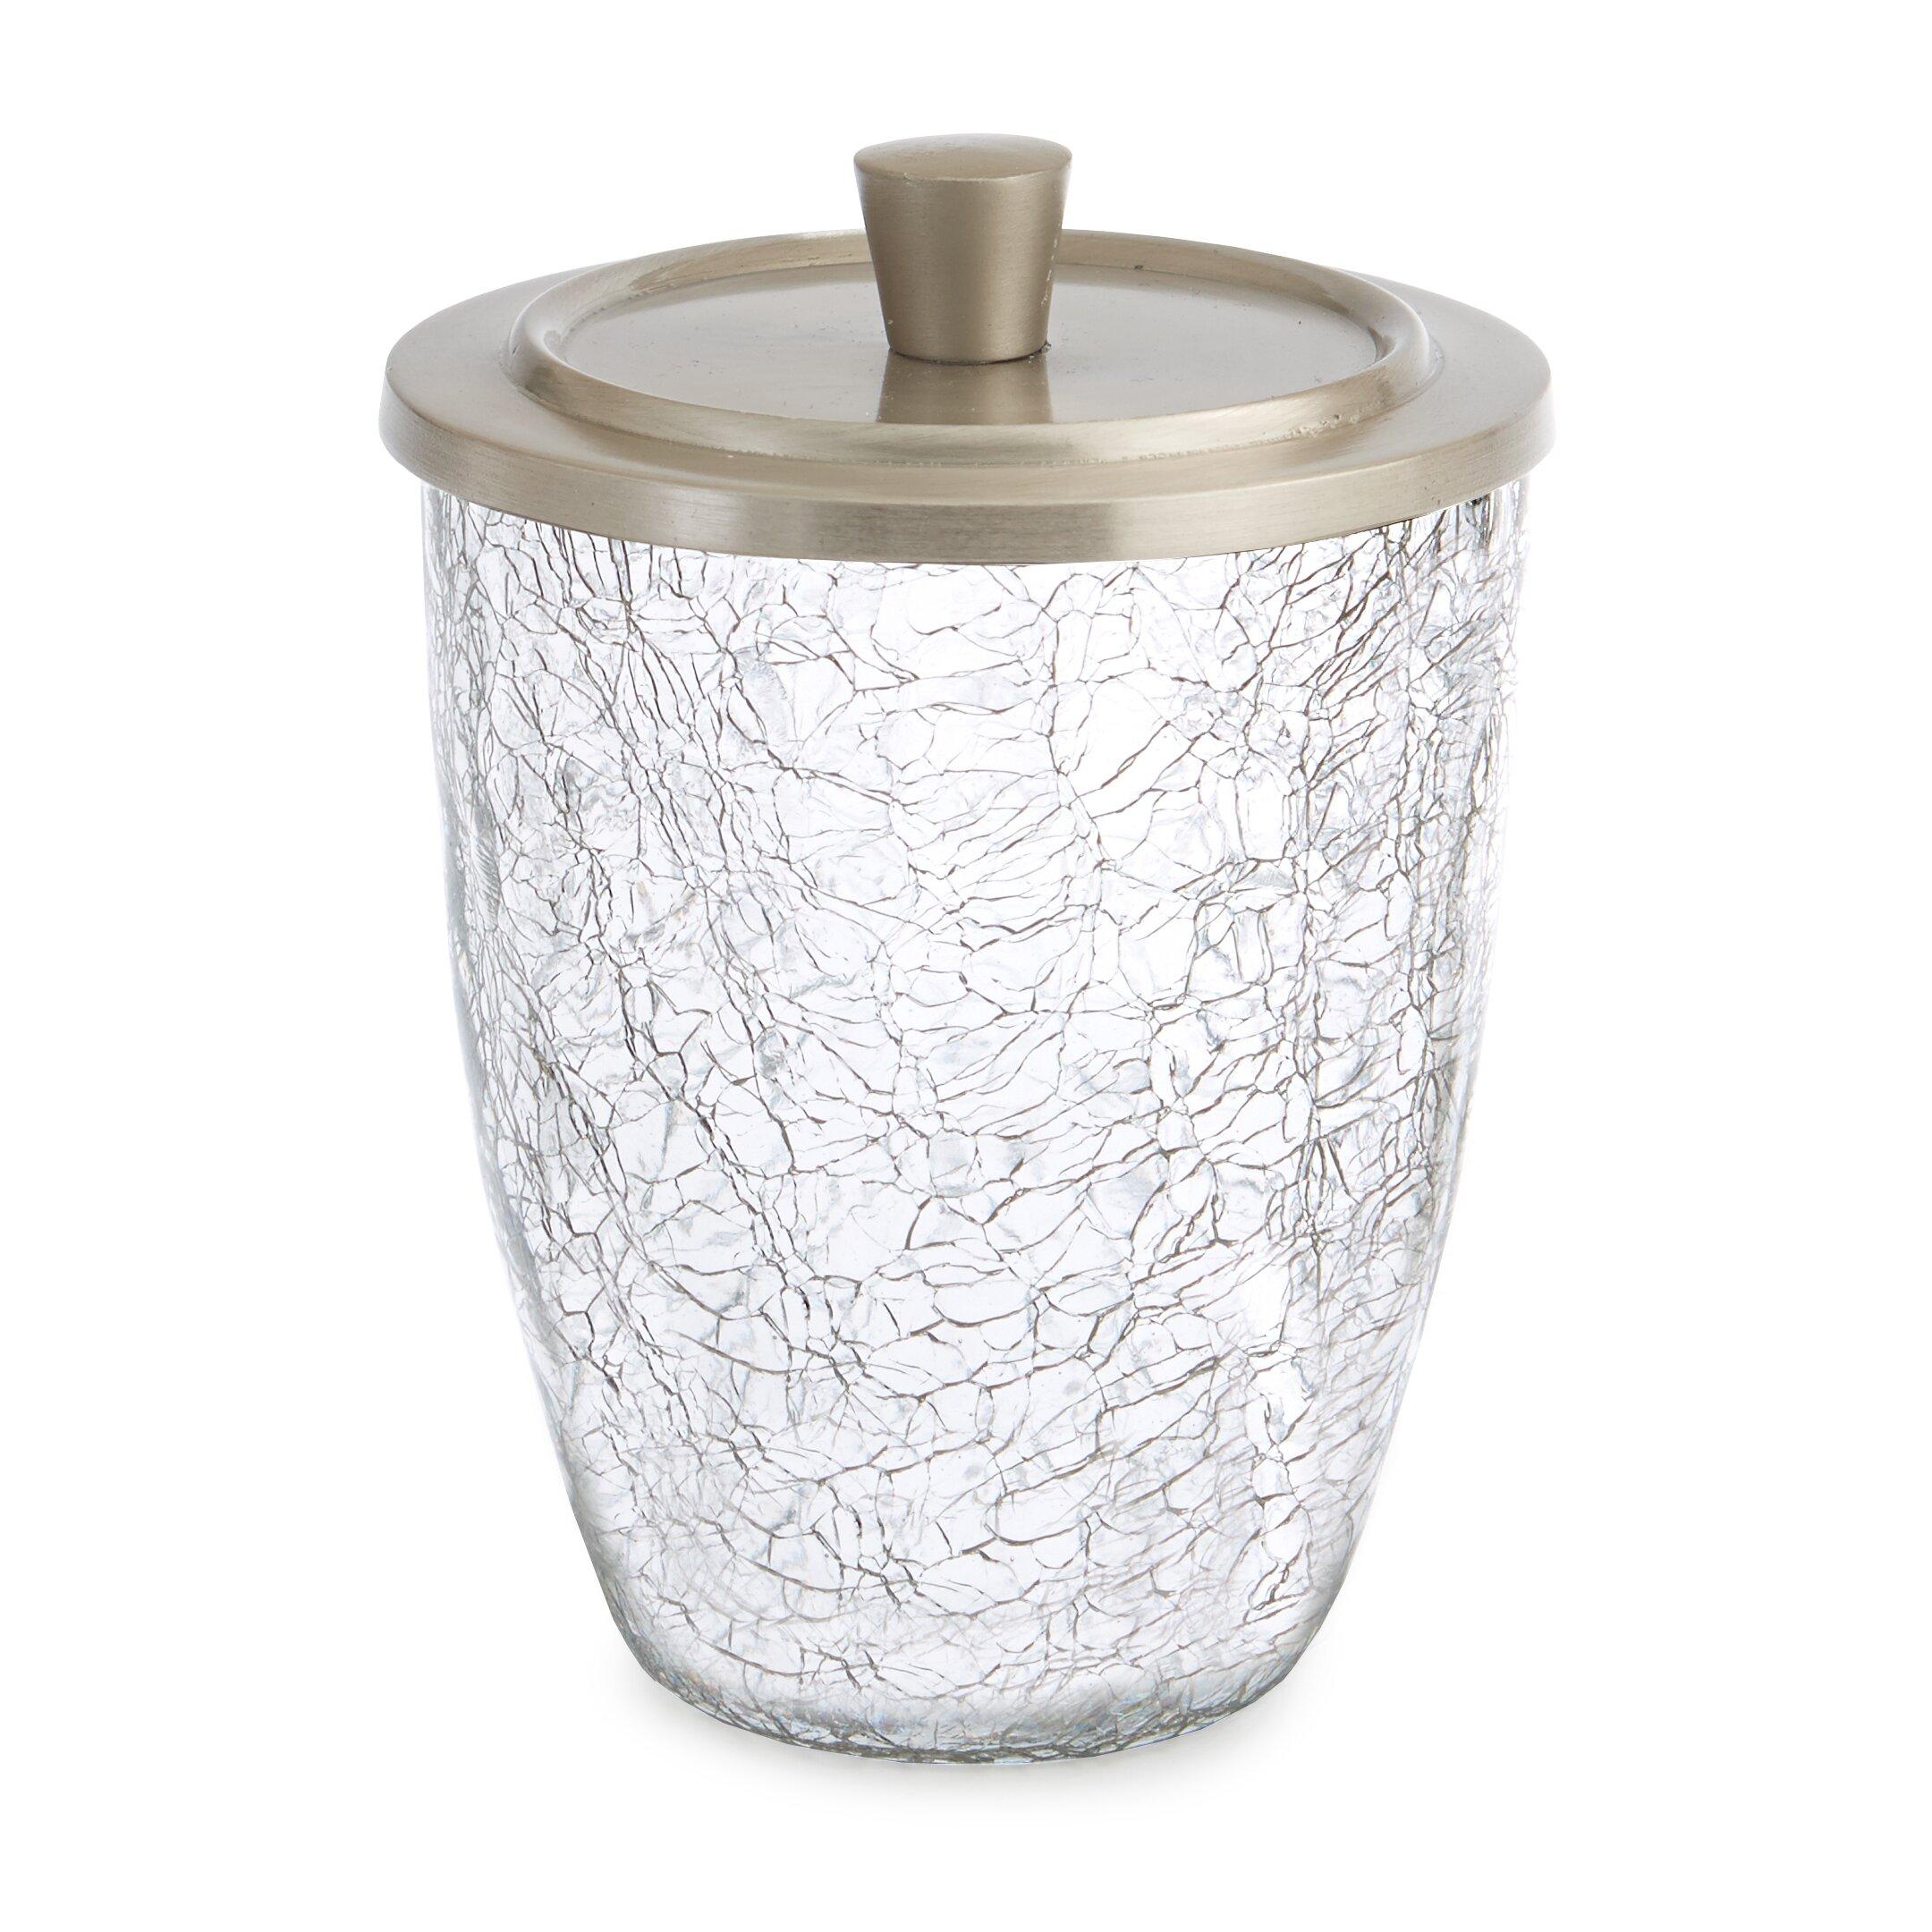 Paradigm trends heirloom 5 piece bathroom accessory set for Glass bathroom accessories sets